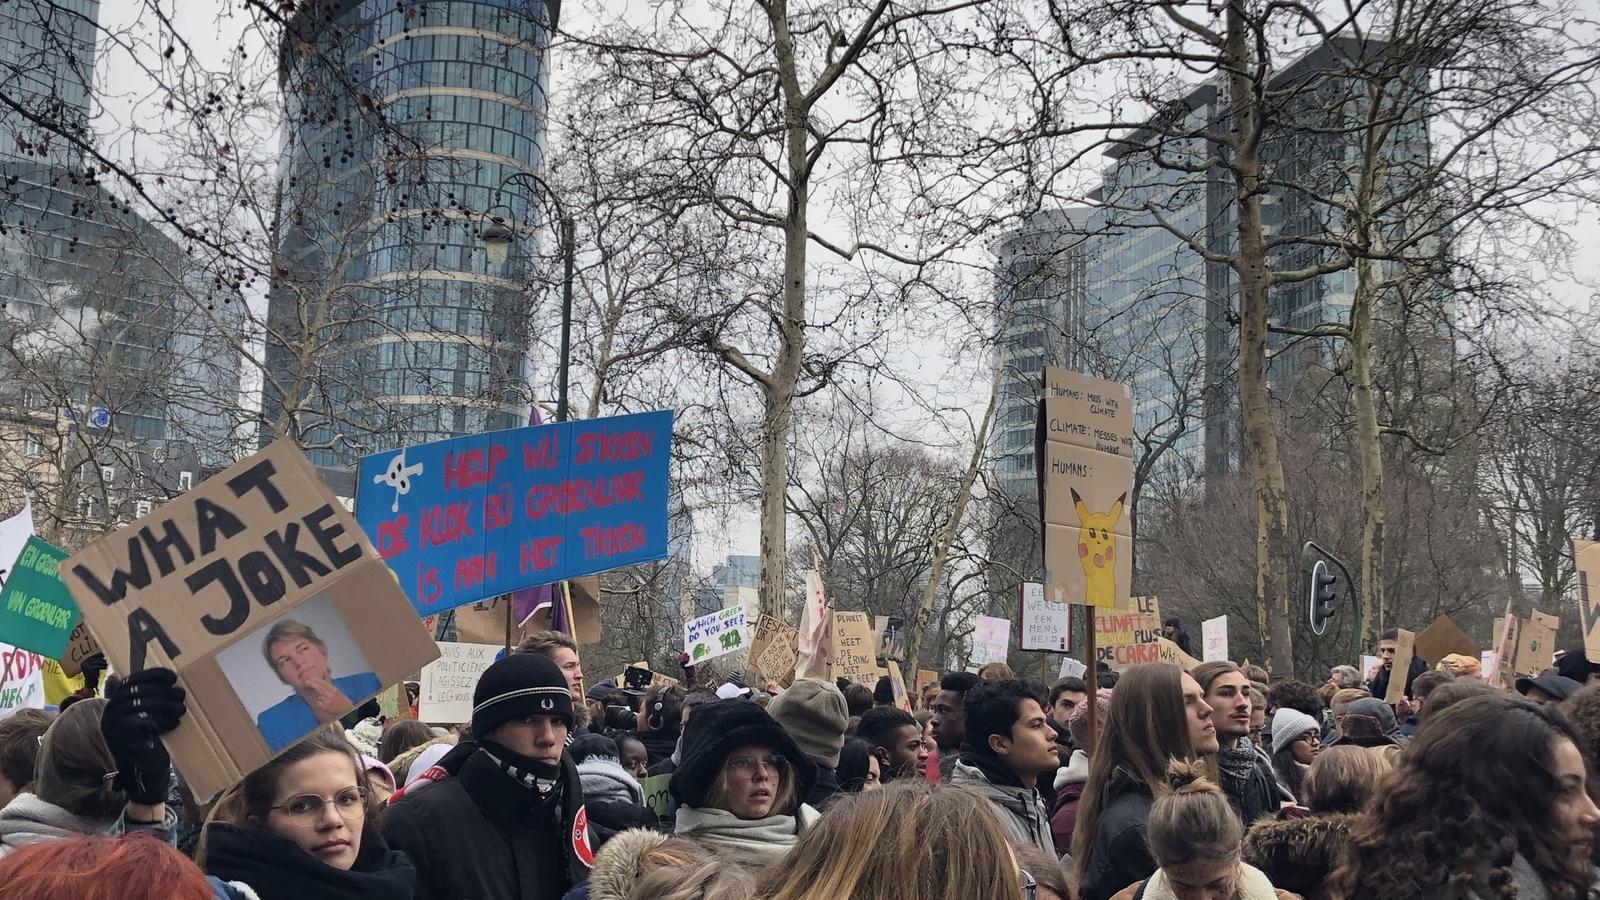 Manifestació del moviment 'Youth for Climate' a Brussel·les